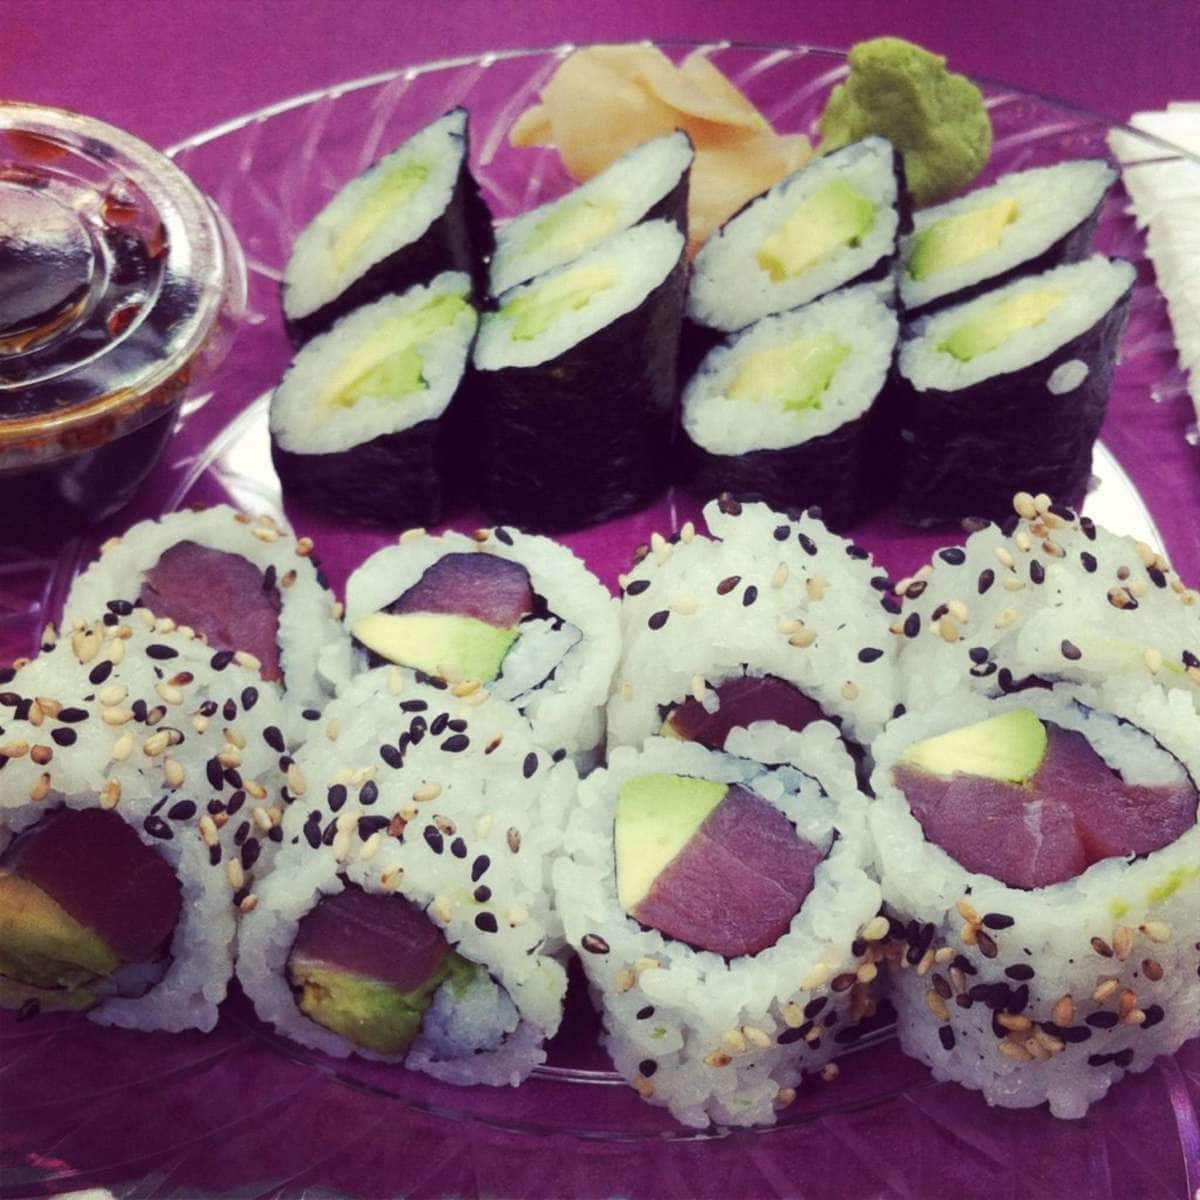 Ichiban Sushi Station Belle Isle Oklahoma City Zomato Sushi station için fotoğraf, fiyat, menü, adres, telefon, yorumlar all trademarks are properties of their respective owners. ichiban sushi station belle isle